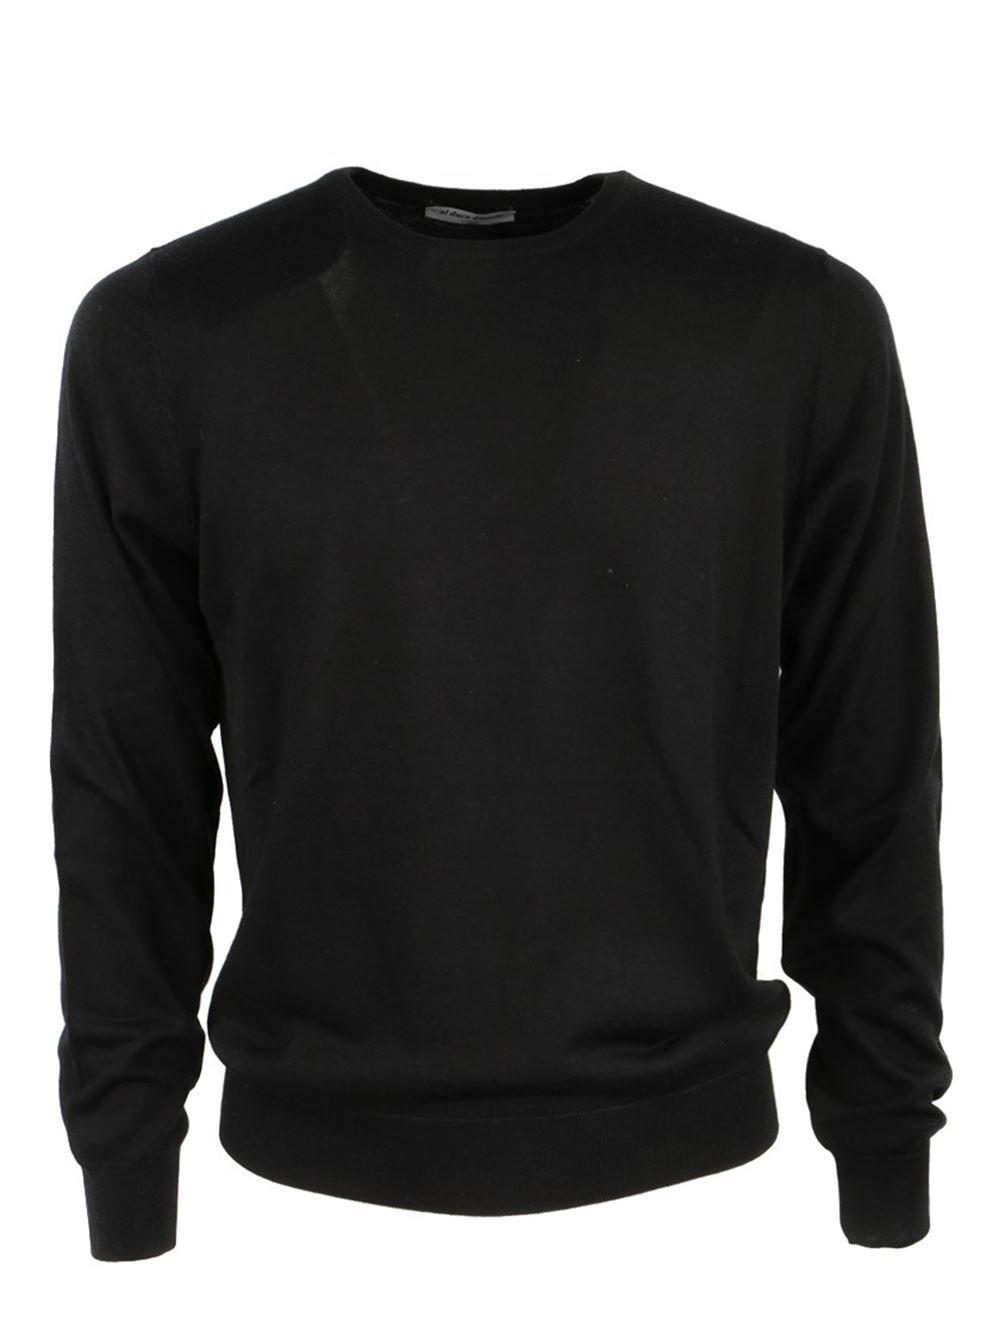 AL DUCA D'AOSTA Black Cashmere And Silk Sweater